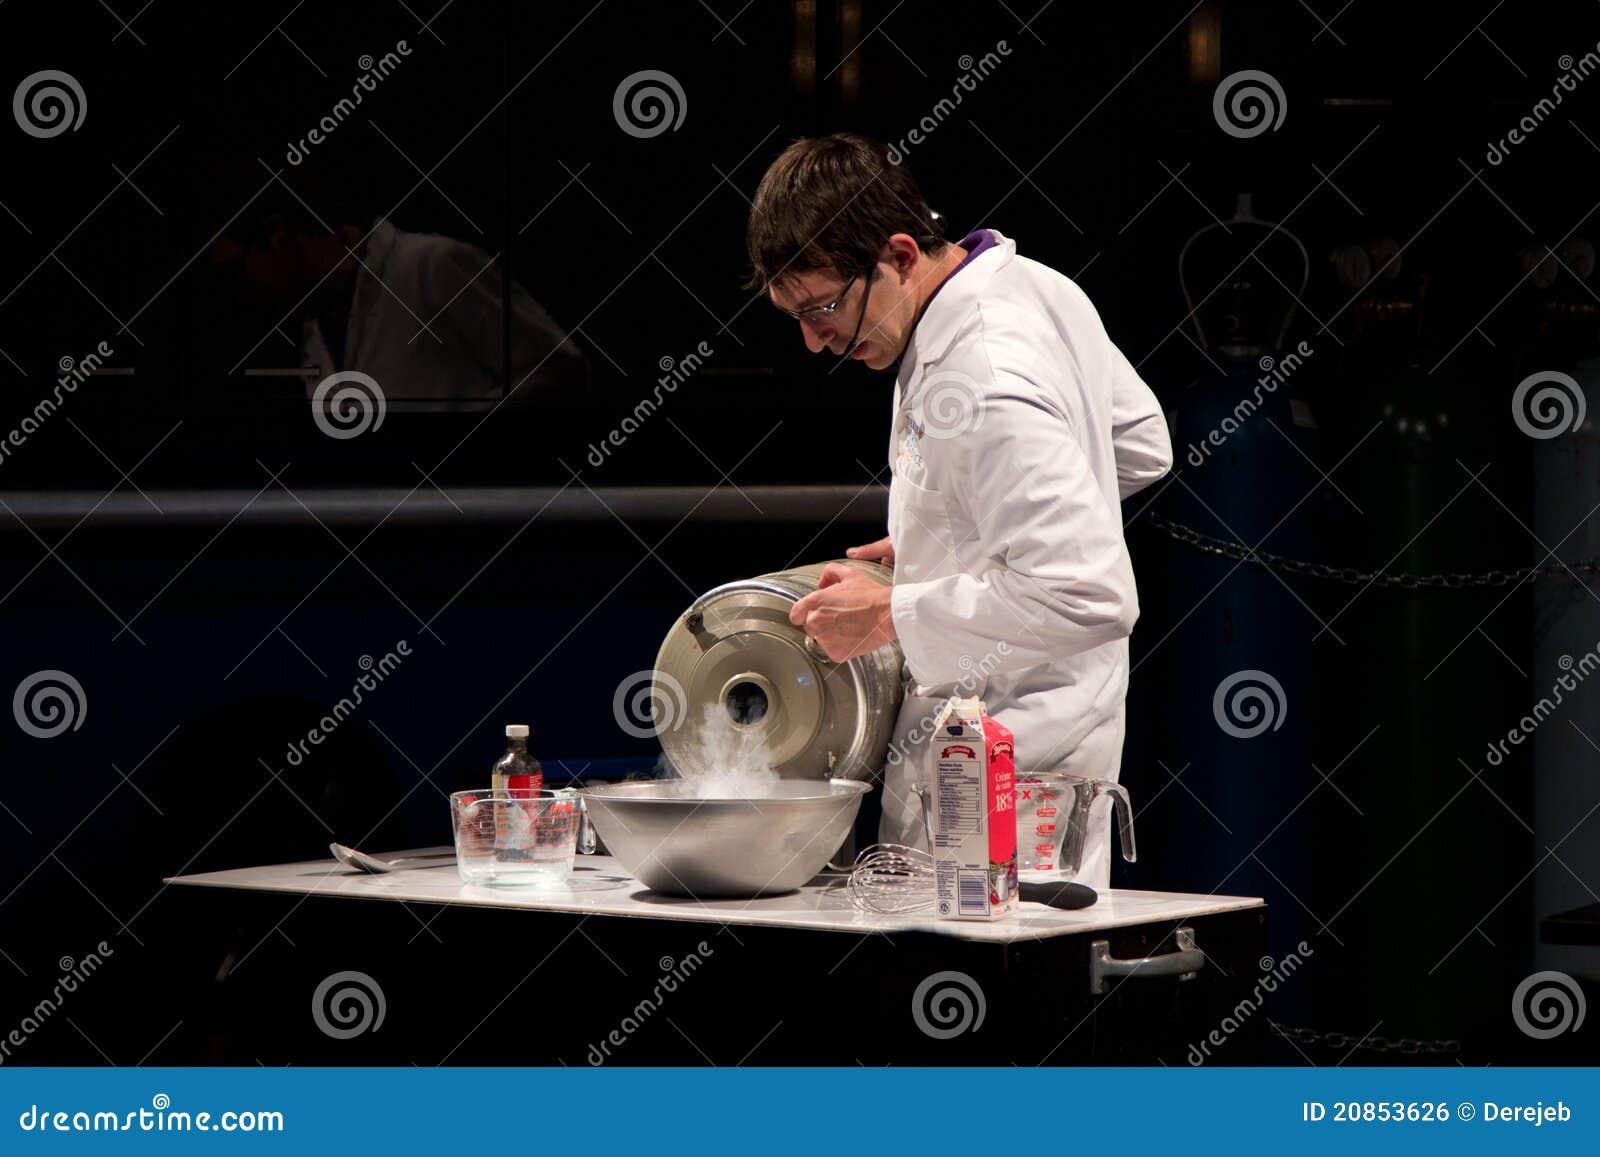 liquid nitrogen ice cream business plan